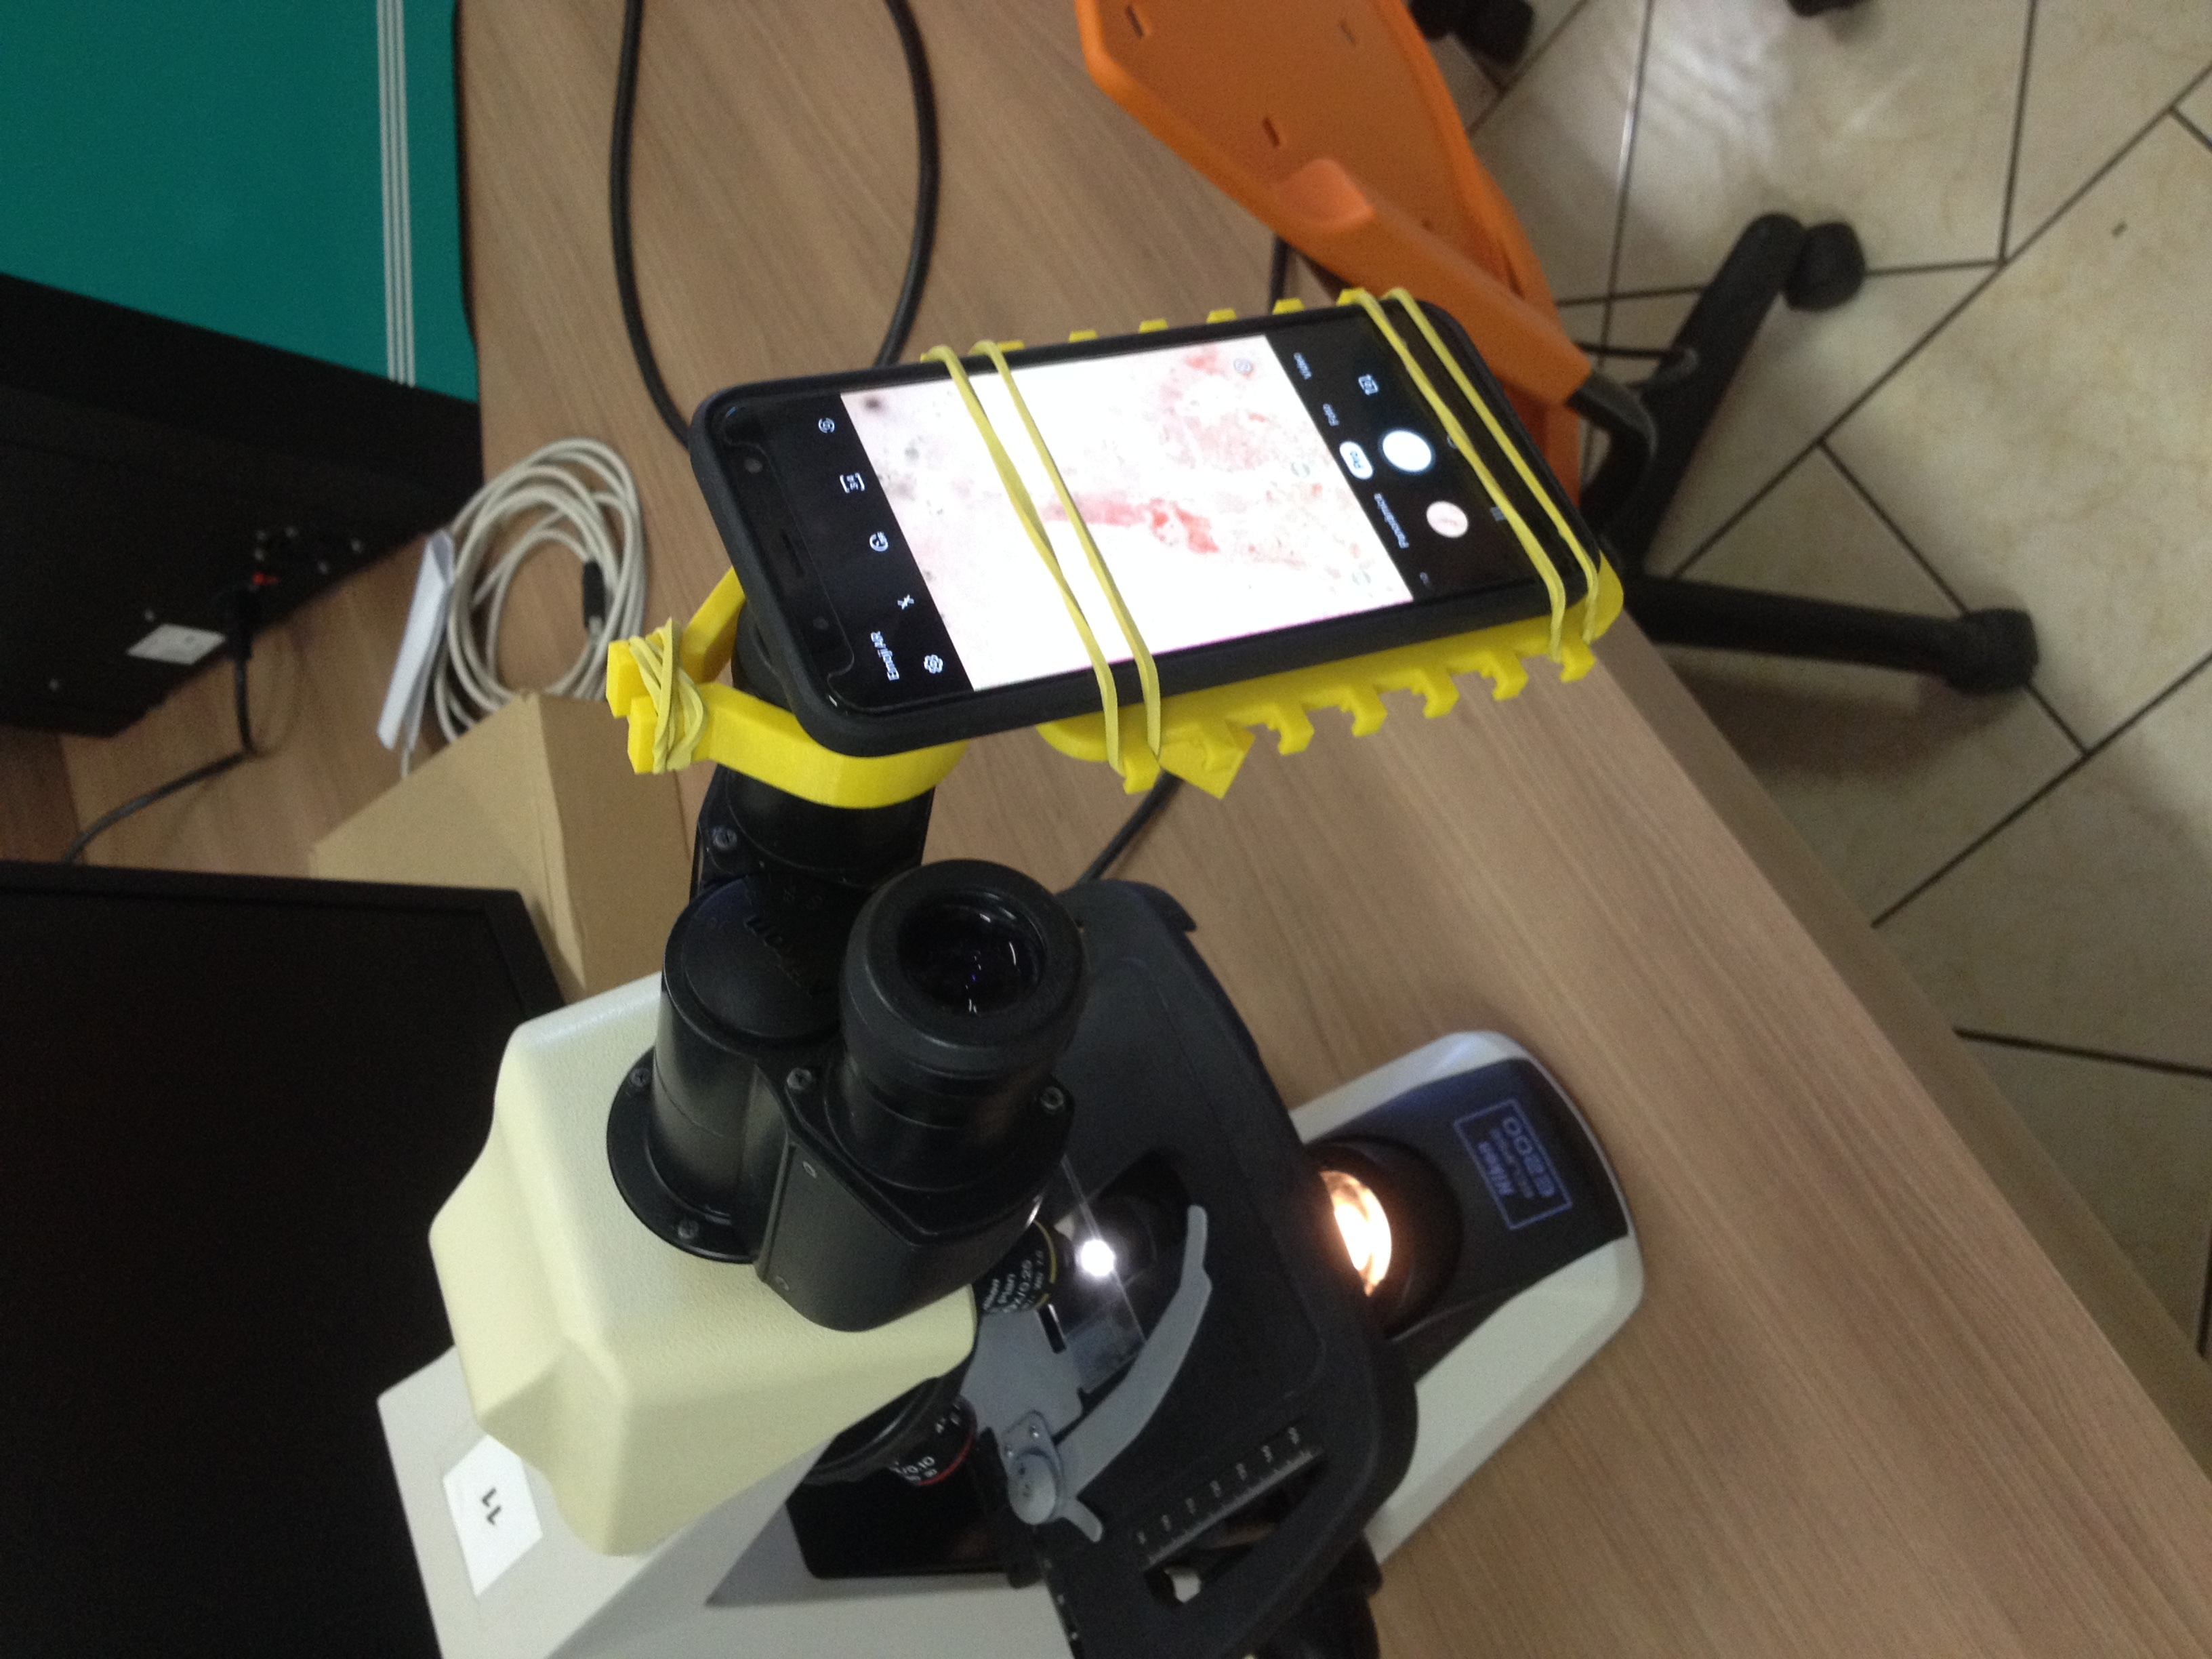 IMG_6151.JPG Download free STL file Microscope cell support - Suporte de celular para microscópio • 3D printer template, fabiomingori